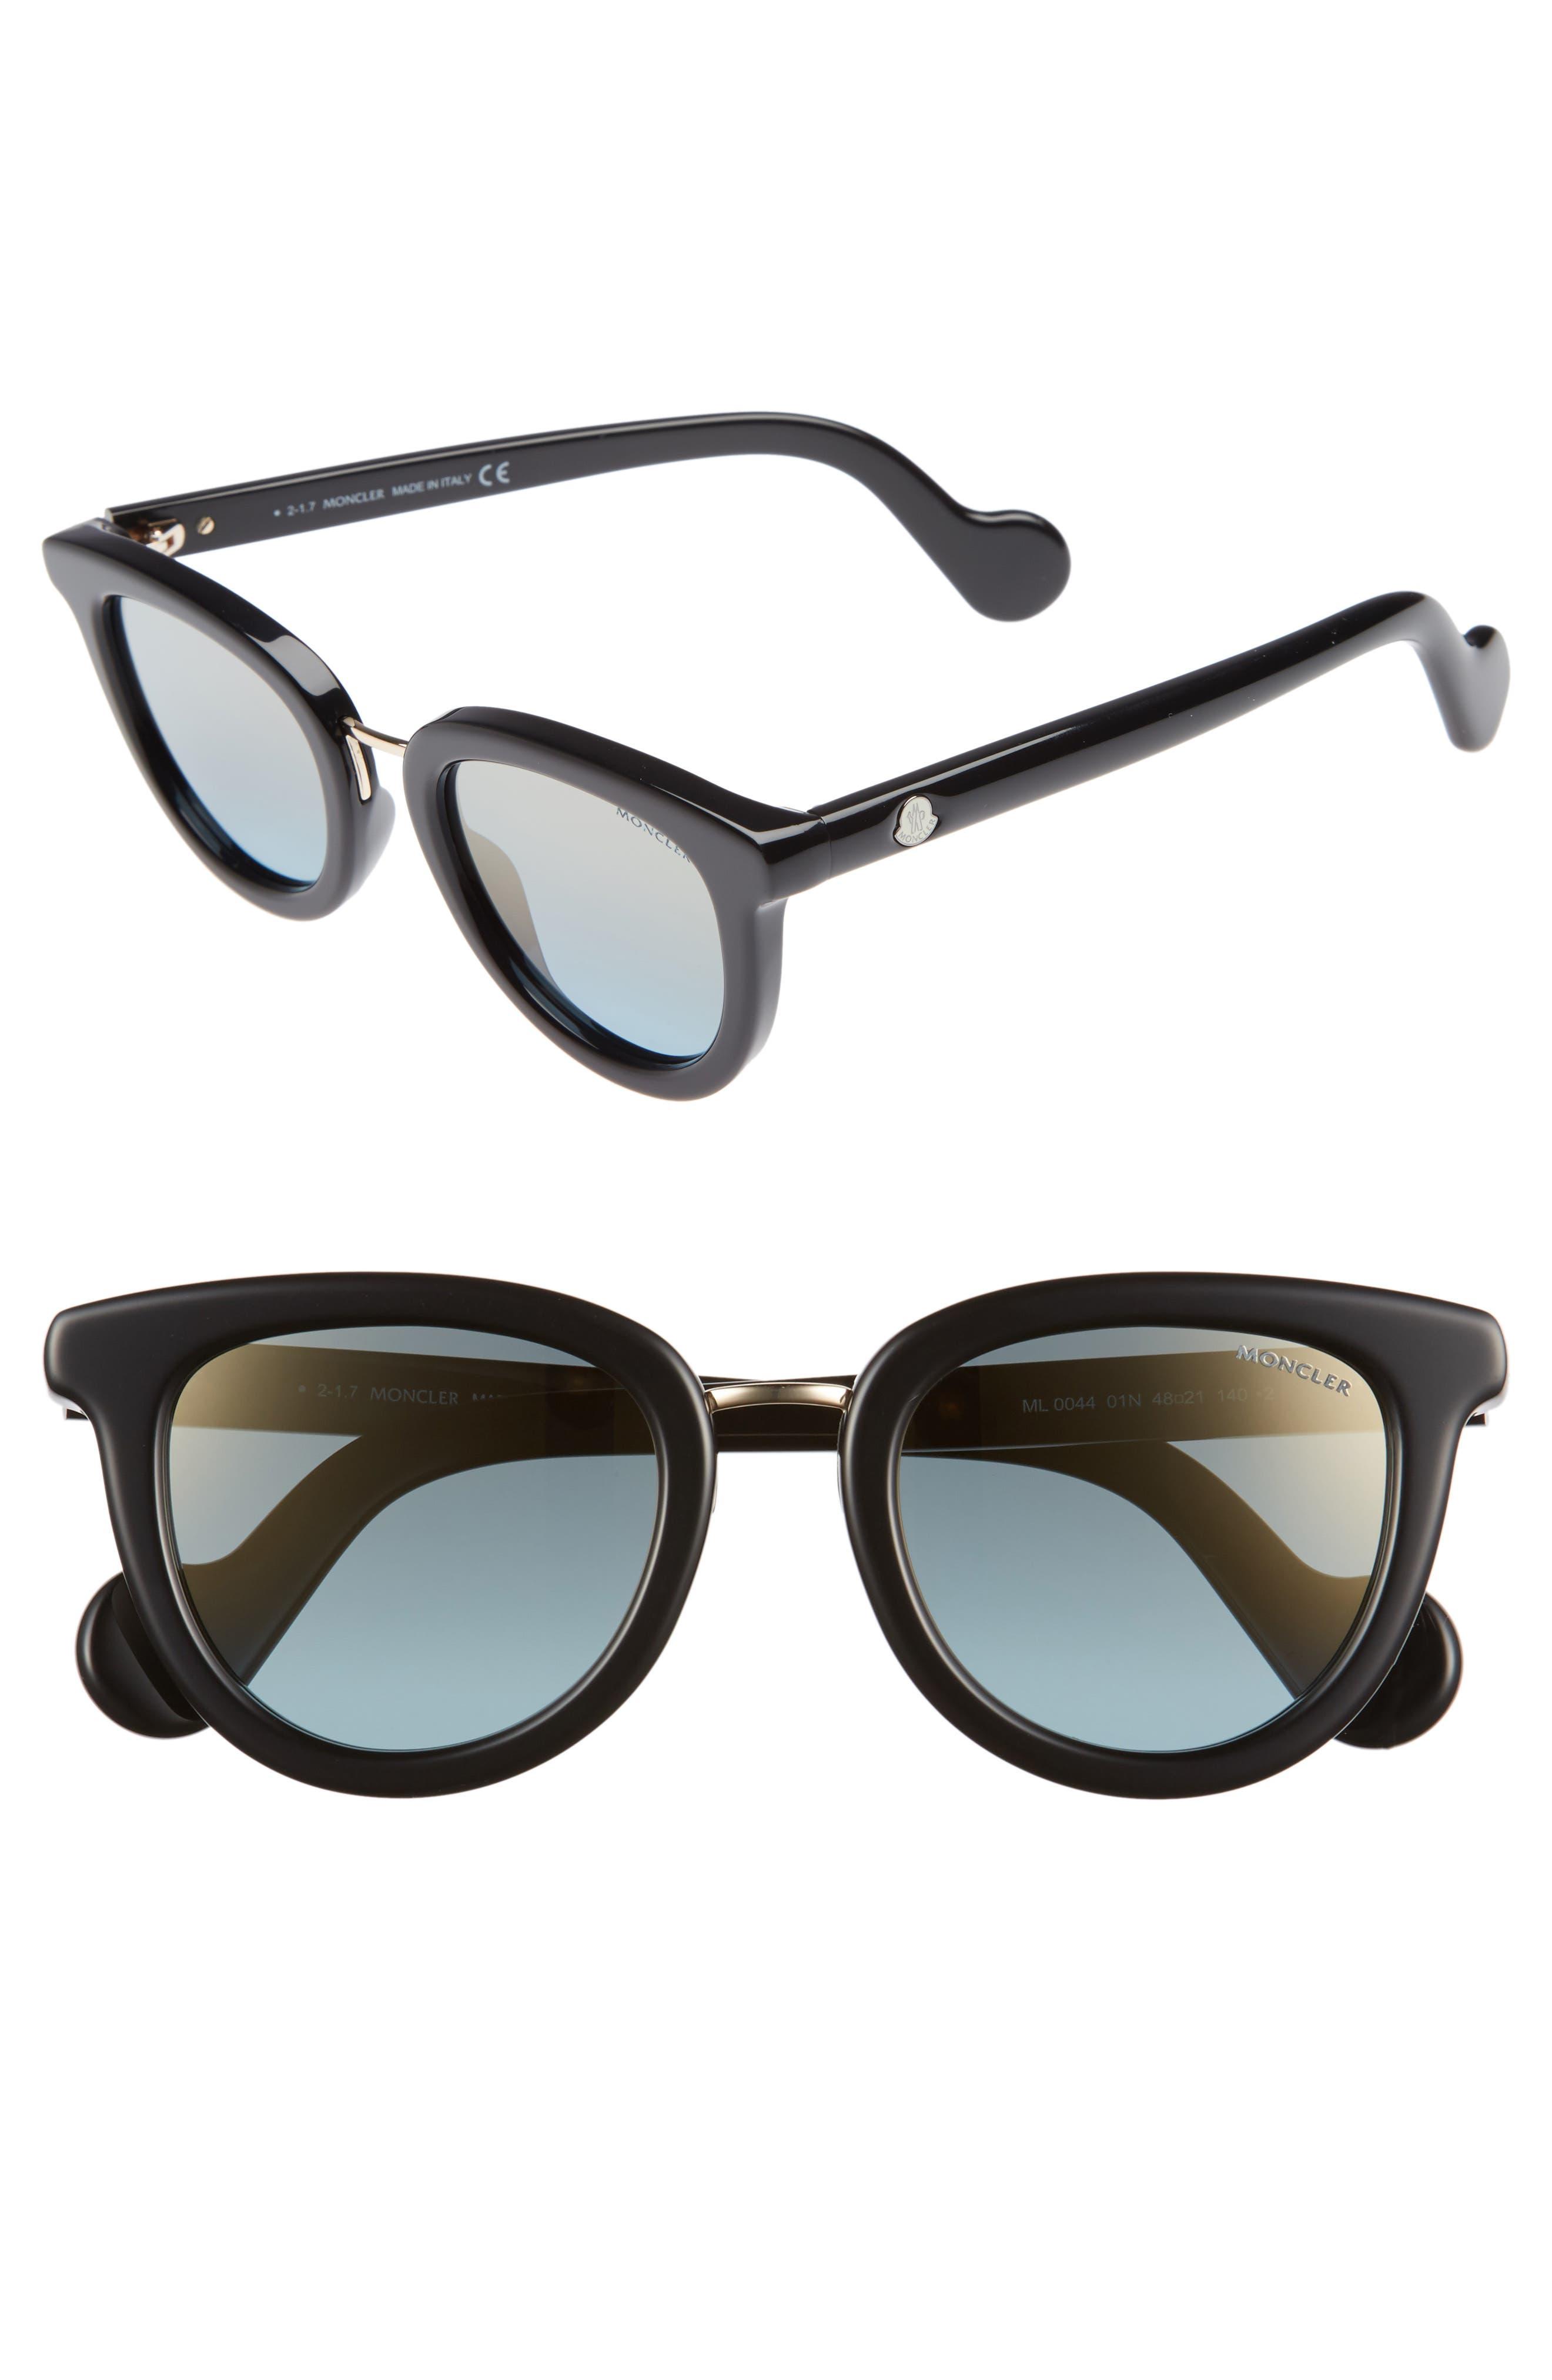 48mm Cat Eye Sunglasses,                             Main thumbnail 1, color,                             BLACK/ PALE GOLD/ LIGHT BLUE